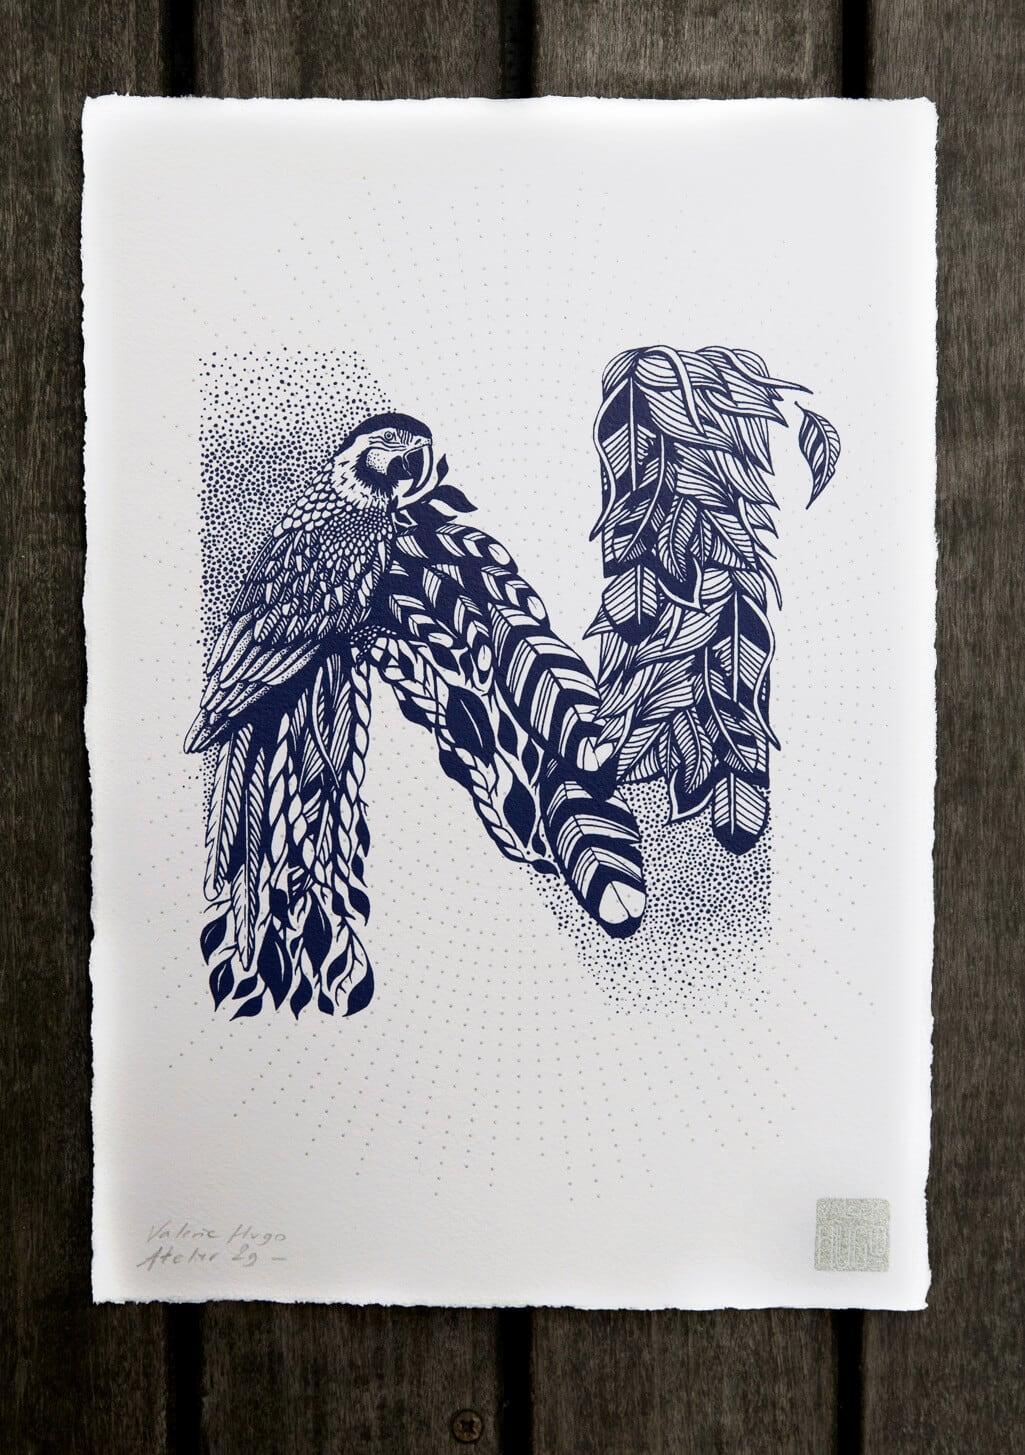 typography-valerie-hugo-fy-9